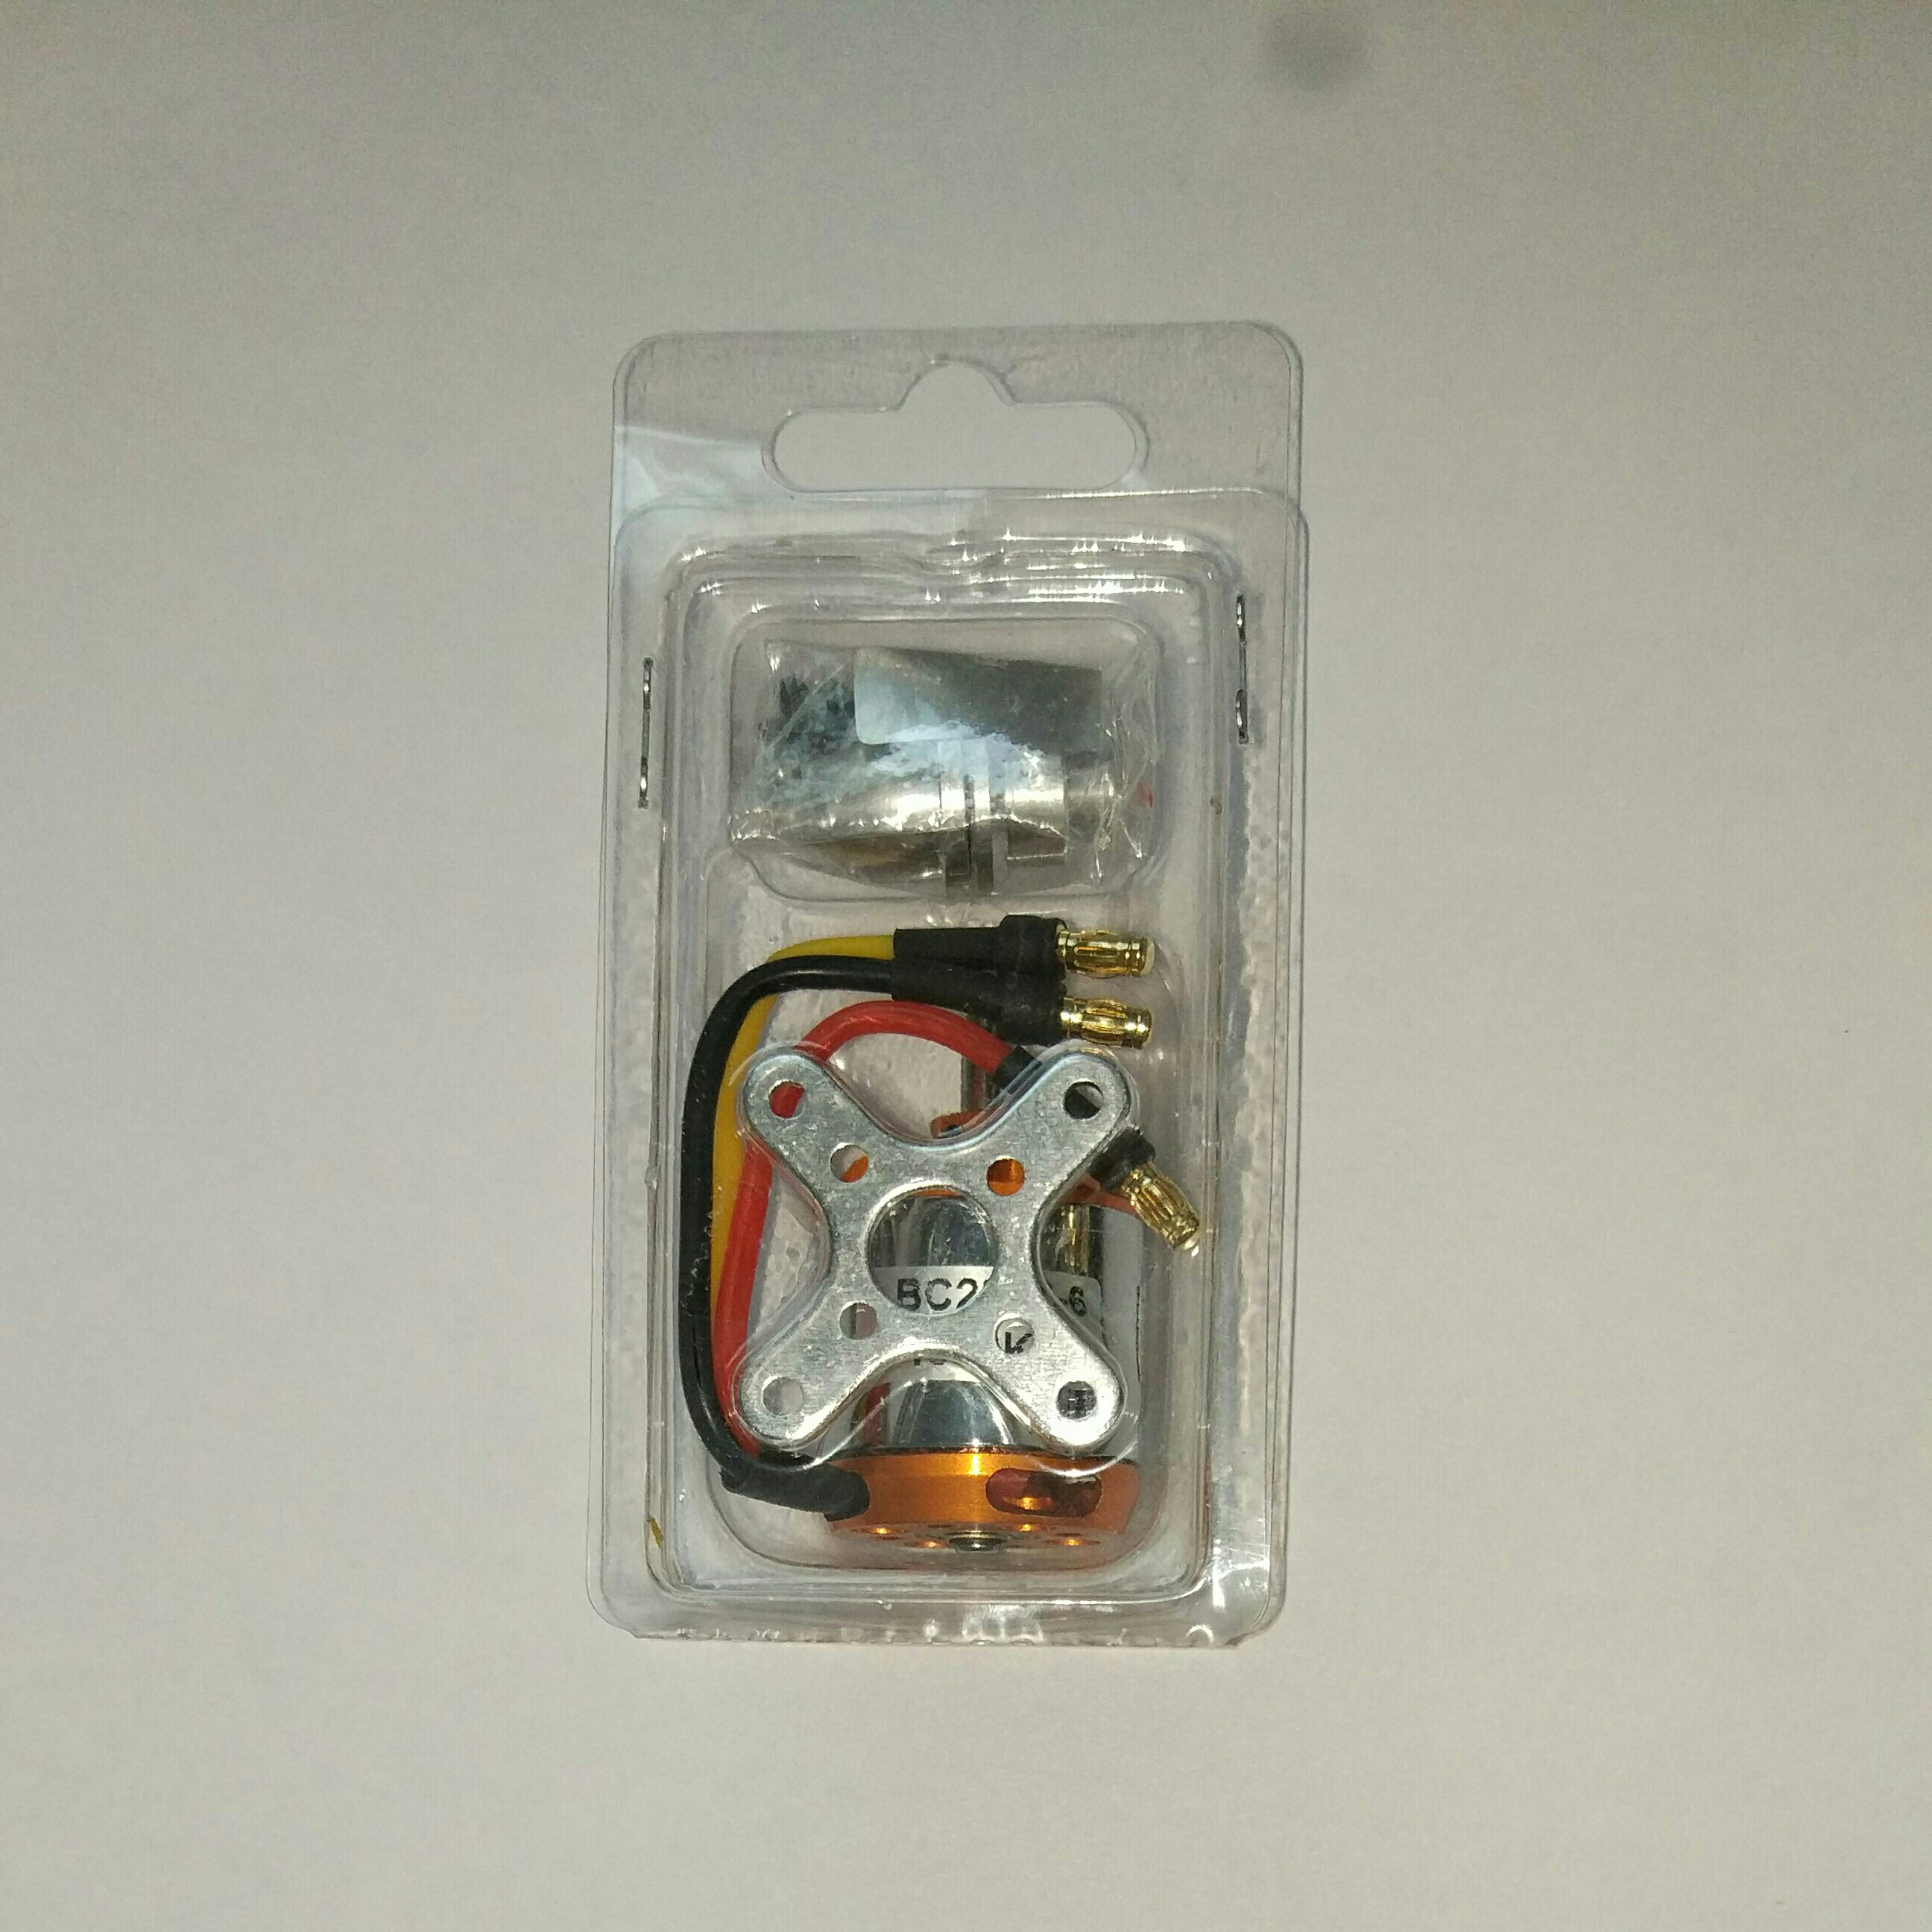 Rctimer 2836 Motor Brushless 750KV 880KV 1120KV 1500KV 4.0 Aci untuk - Mainan kawalan radio - Foto 4